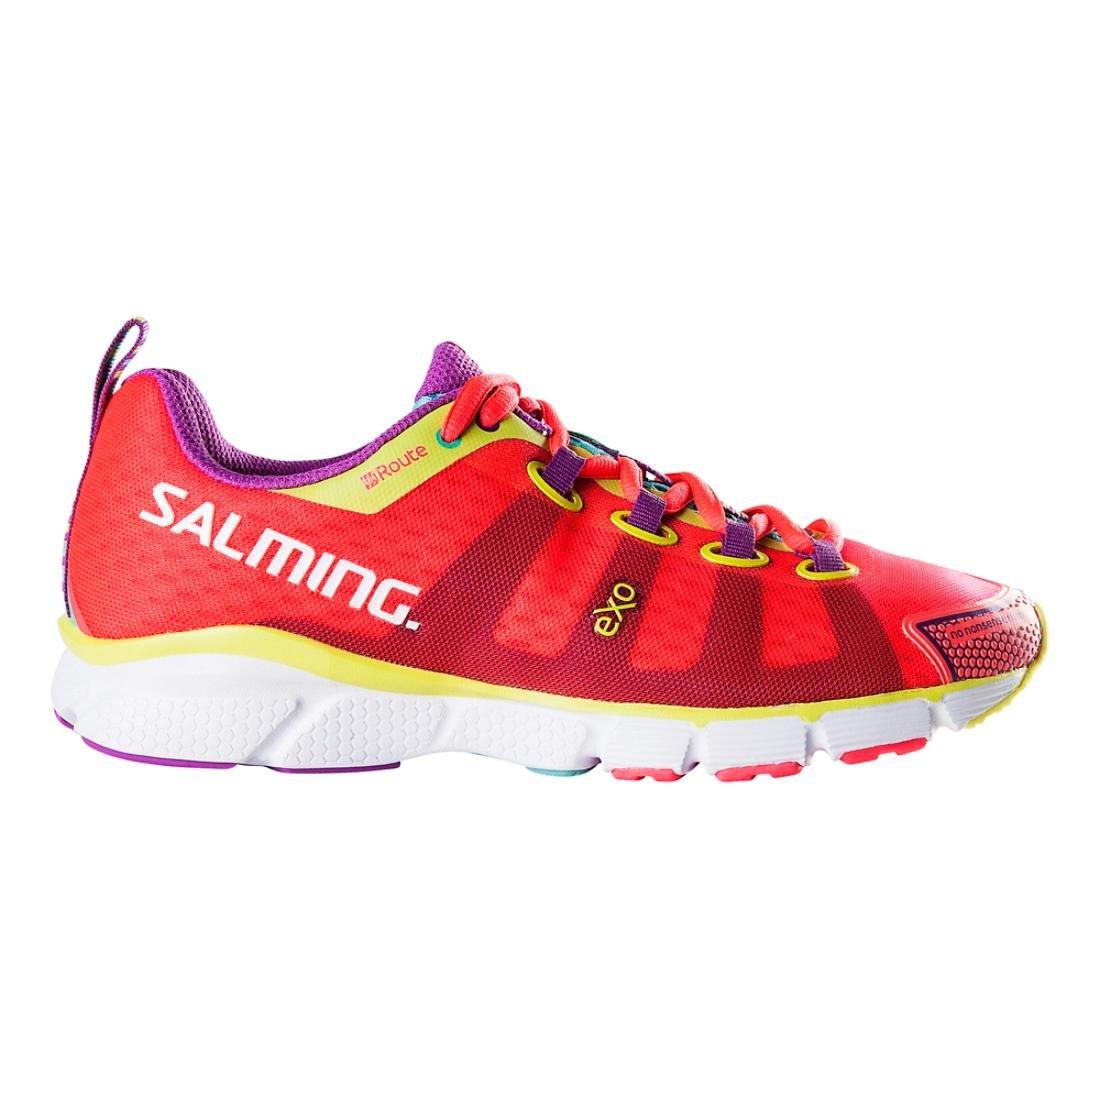 Salming enRoute scarpe donna Diva rosa